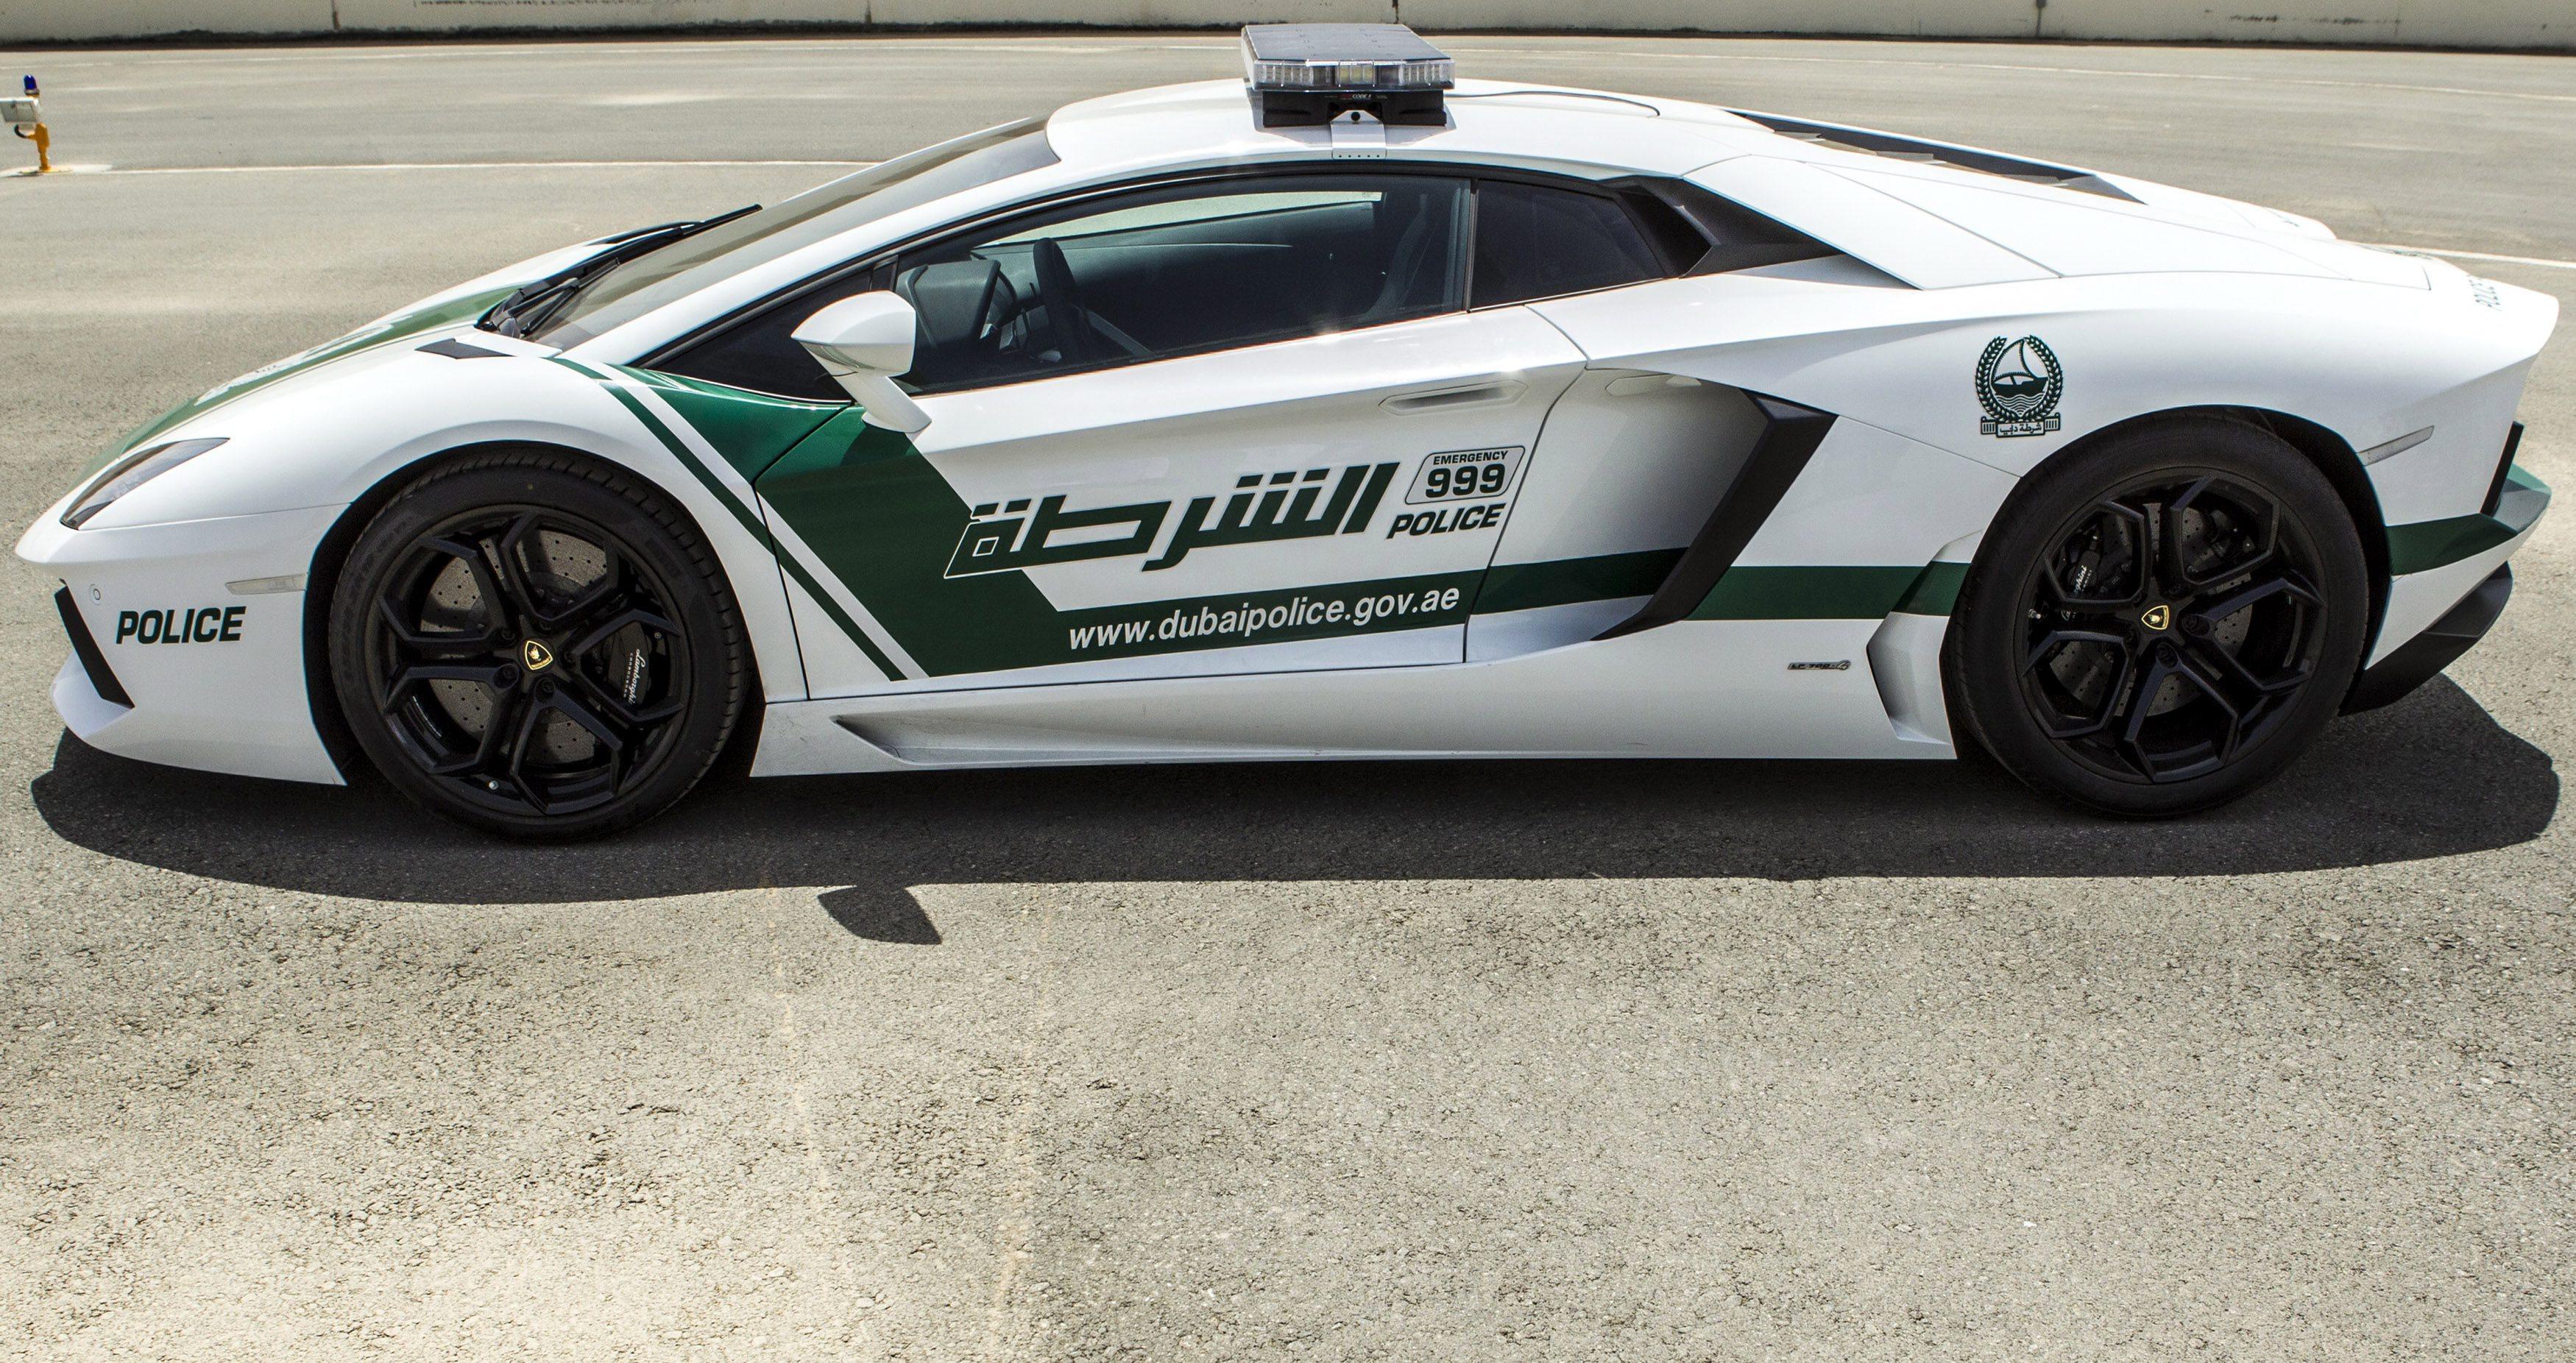 Dubai_police.jpg